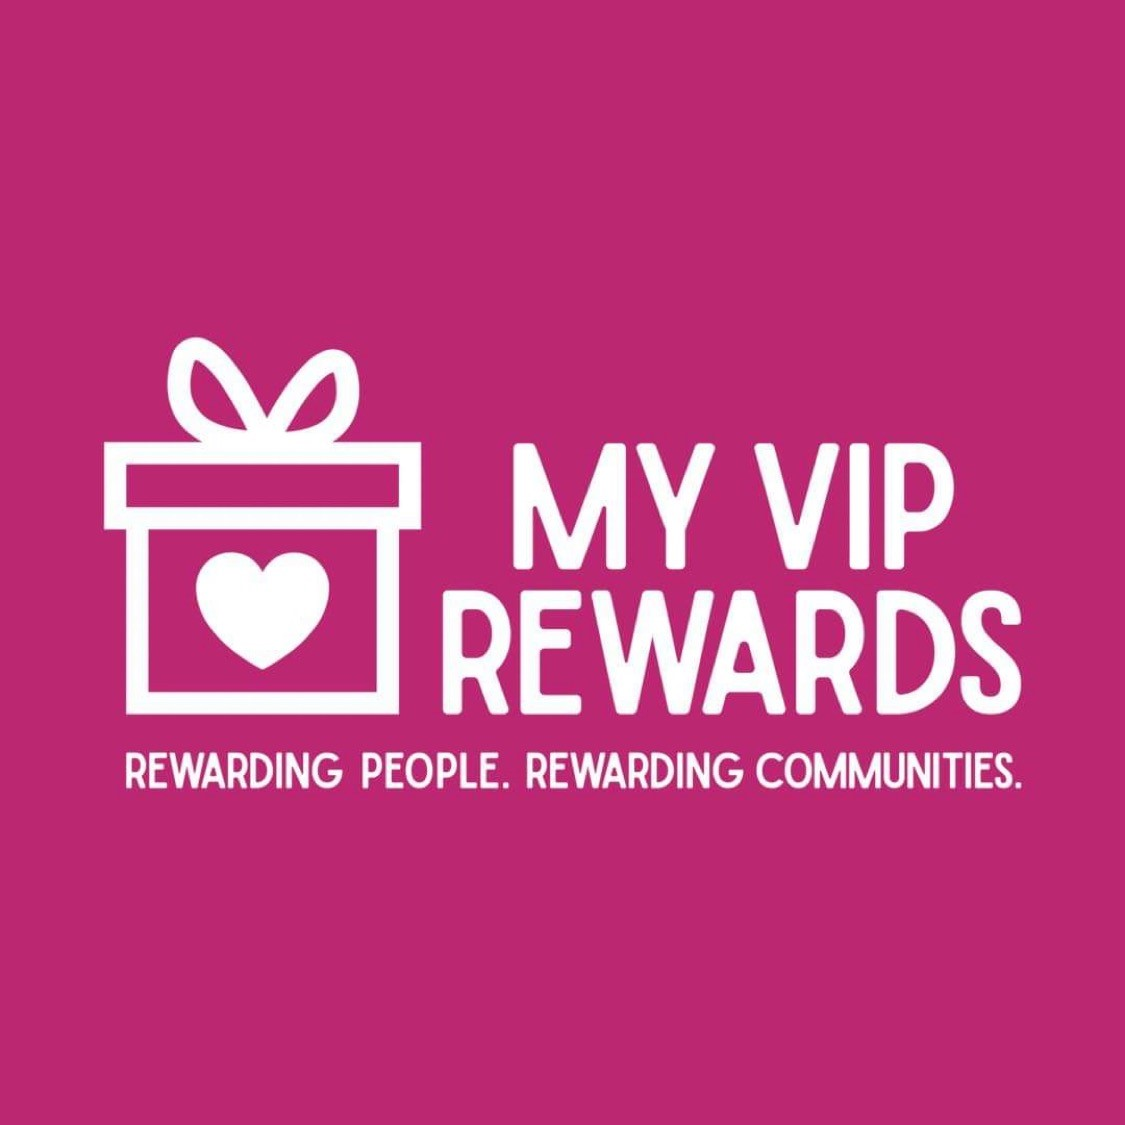 My VIP Rewards